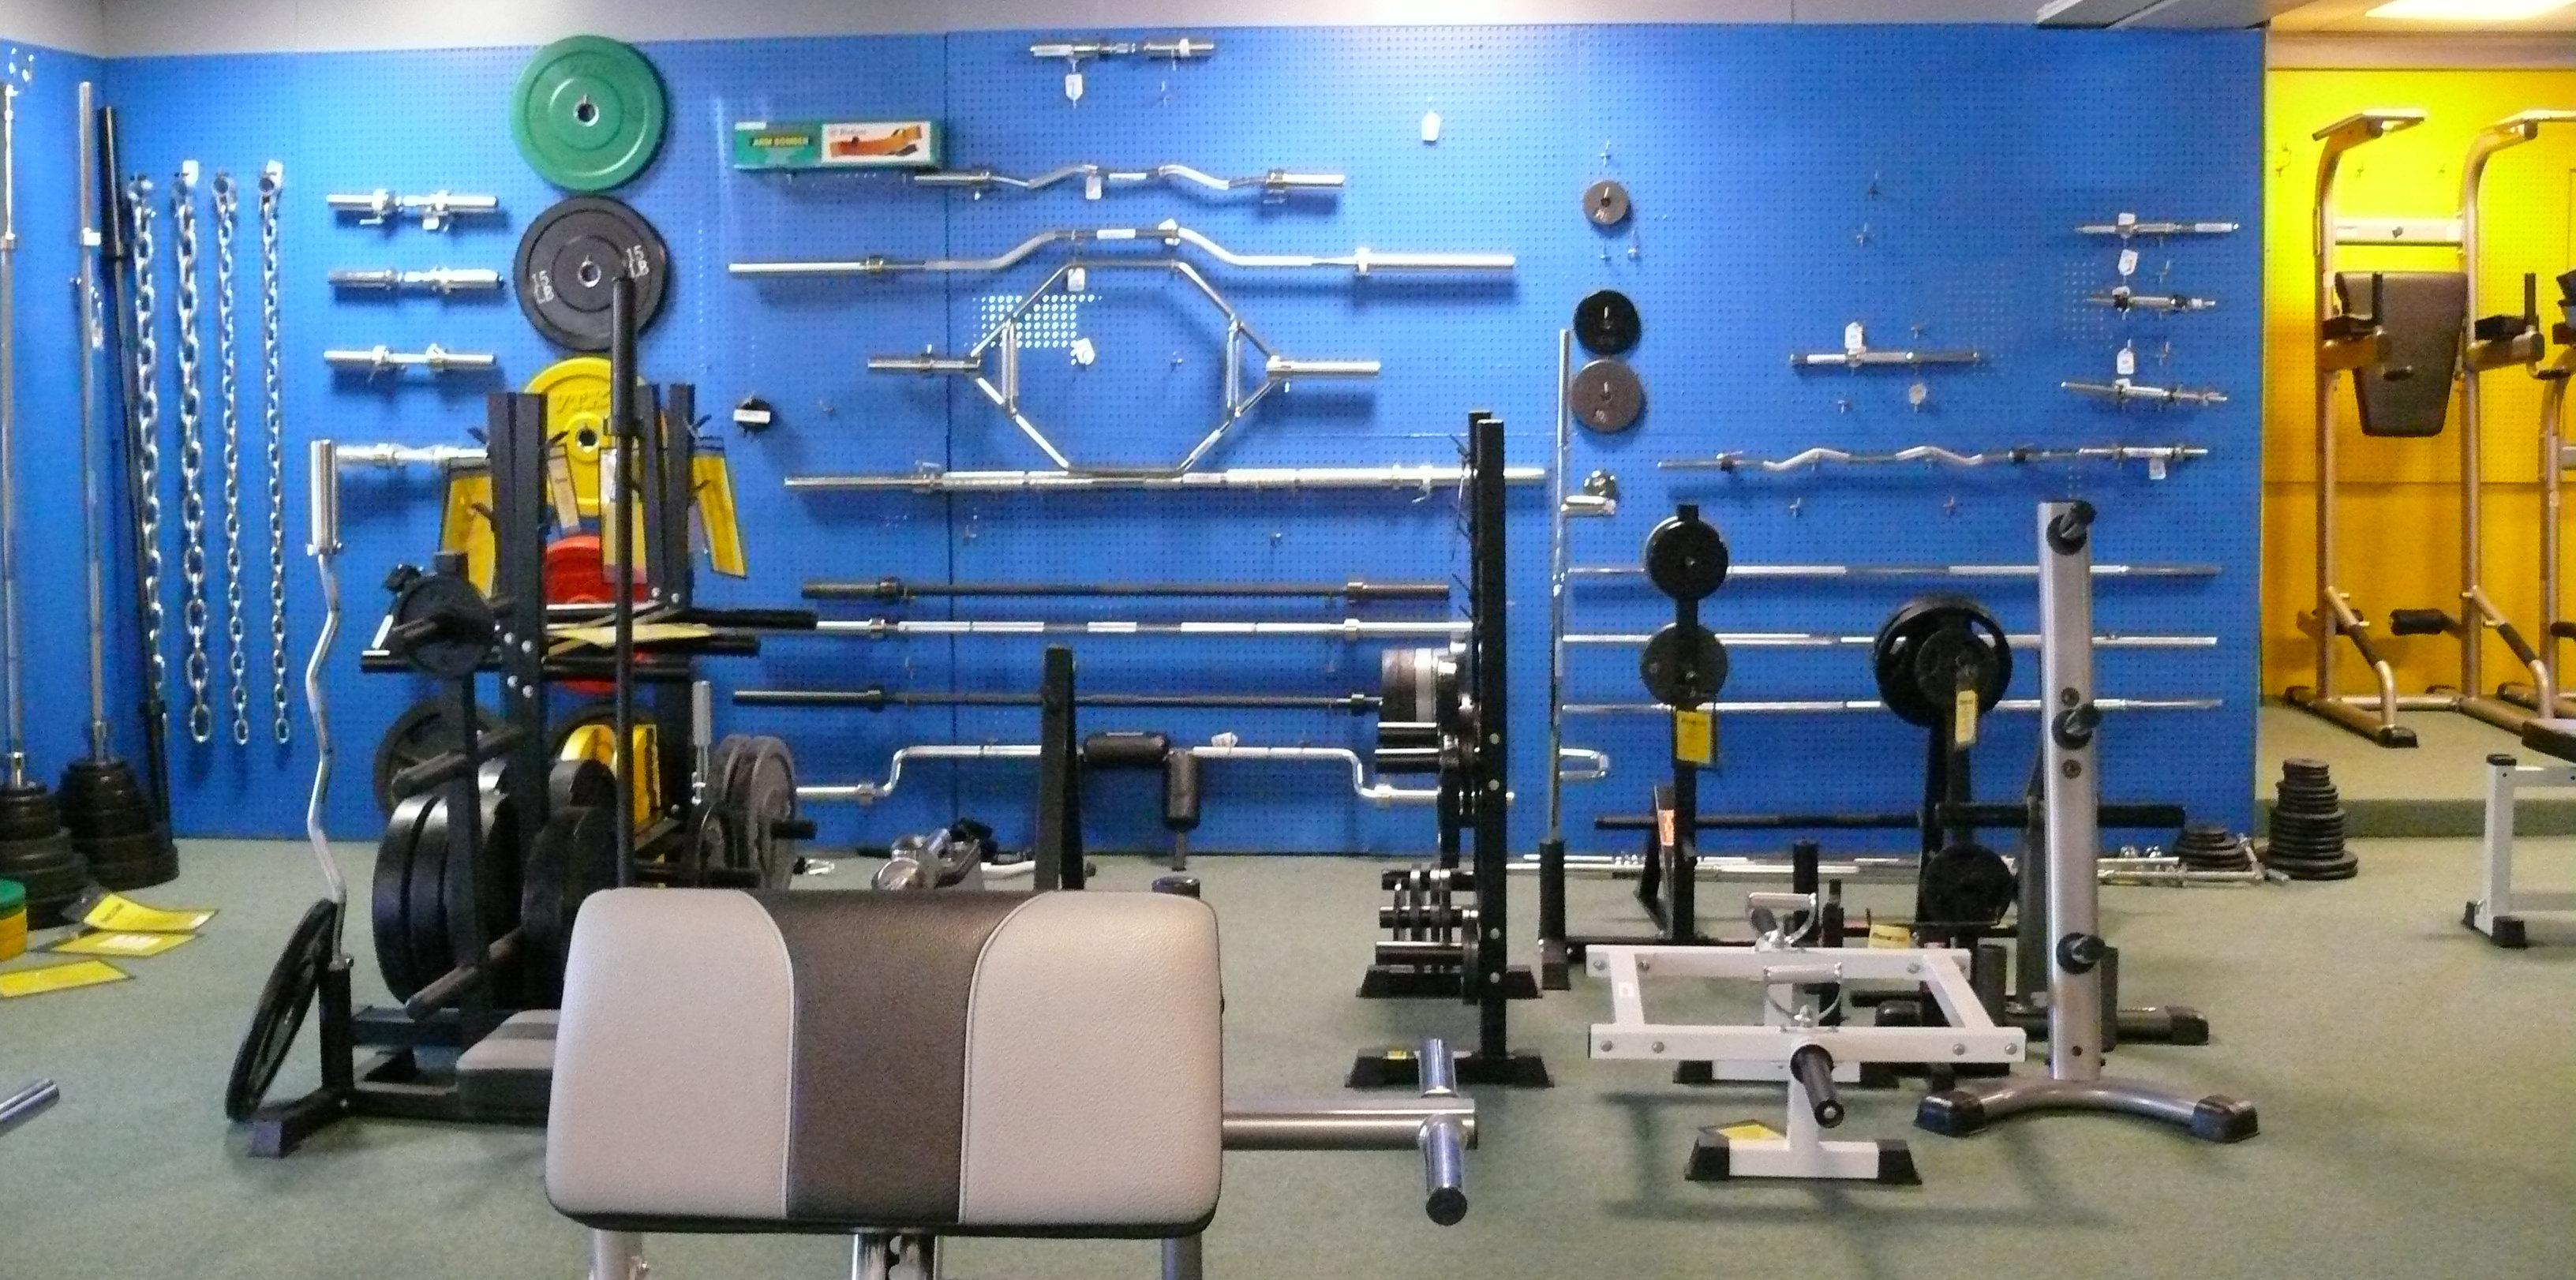 Fitness Serve | Fitness Equipment | Exercise Equipment Cleveland